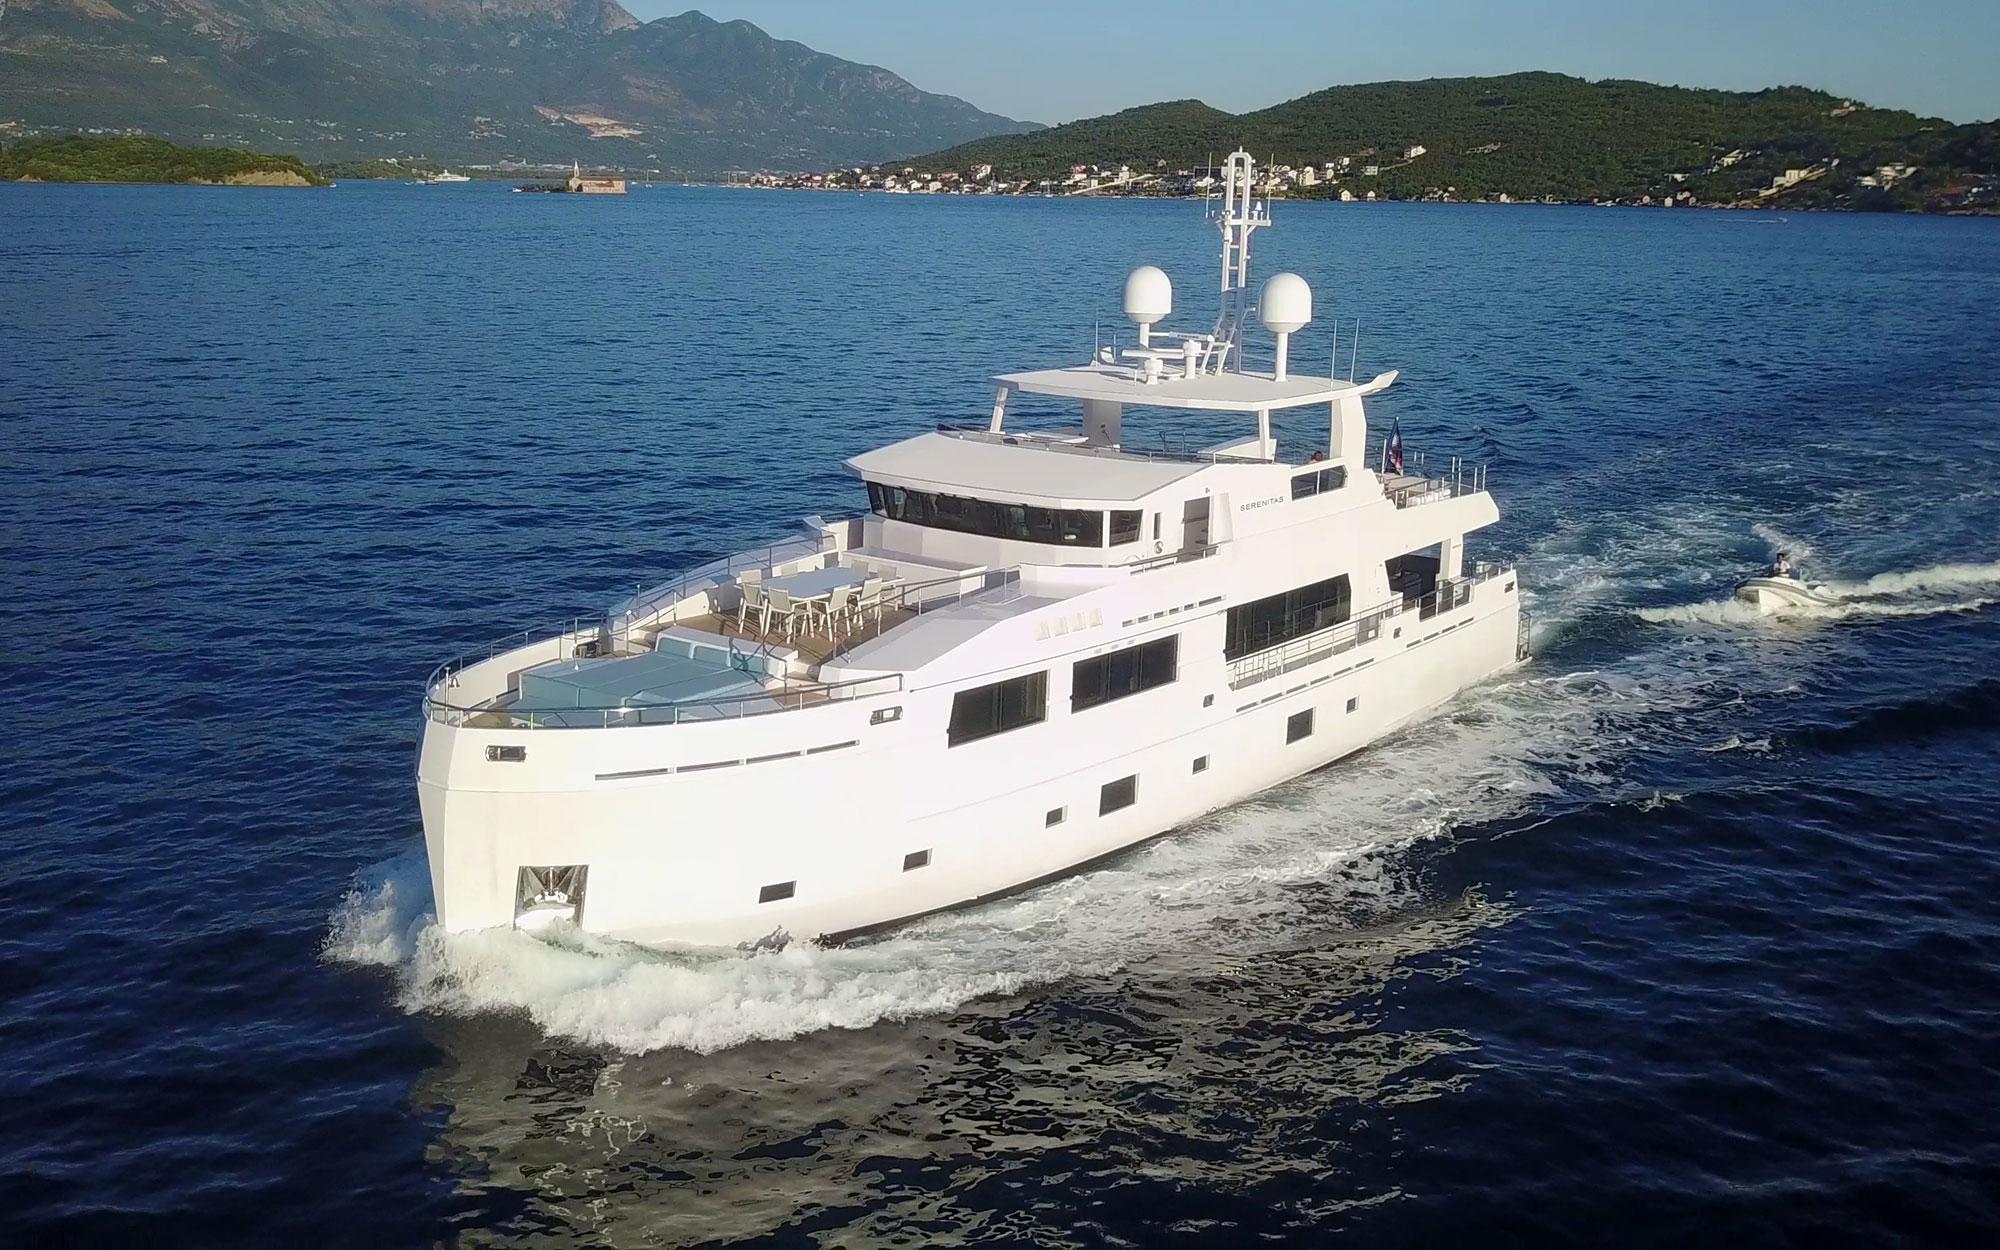 SERENITAS-yacht-for-sale-for-charter-01.jpg